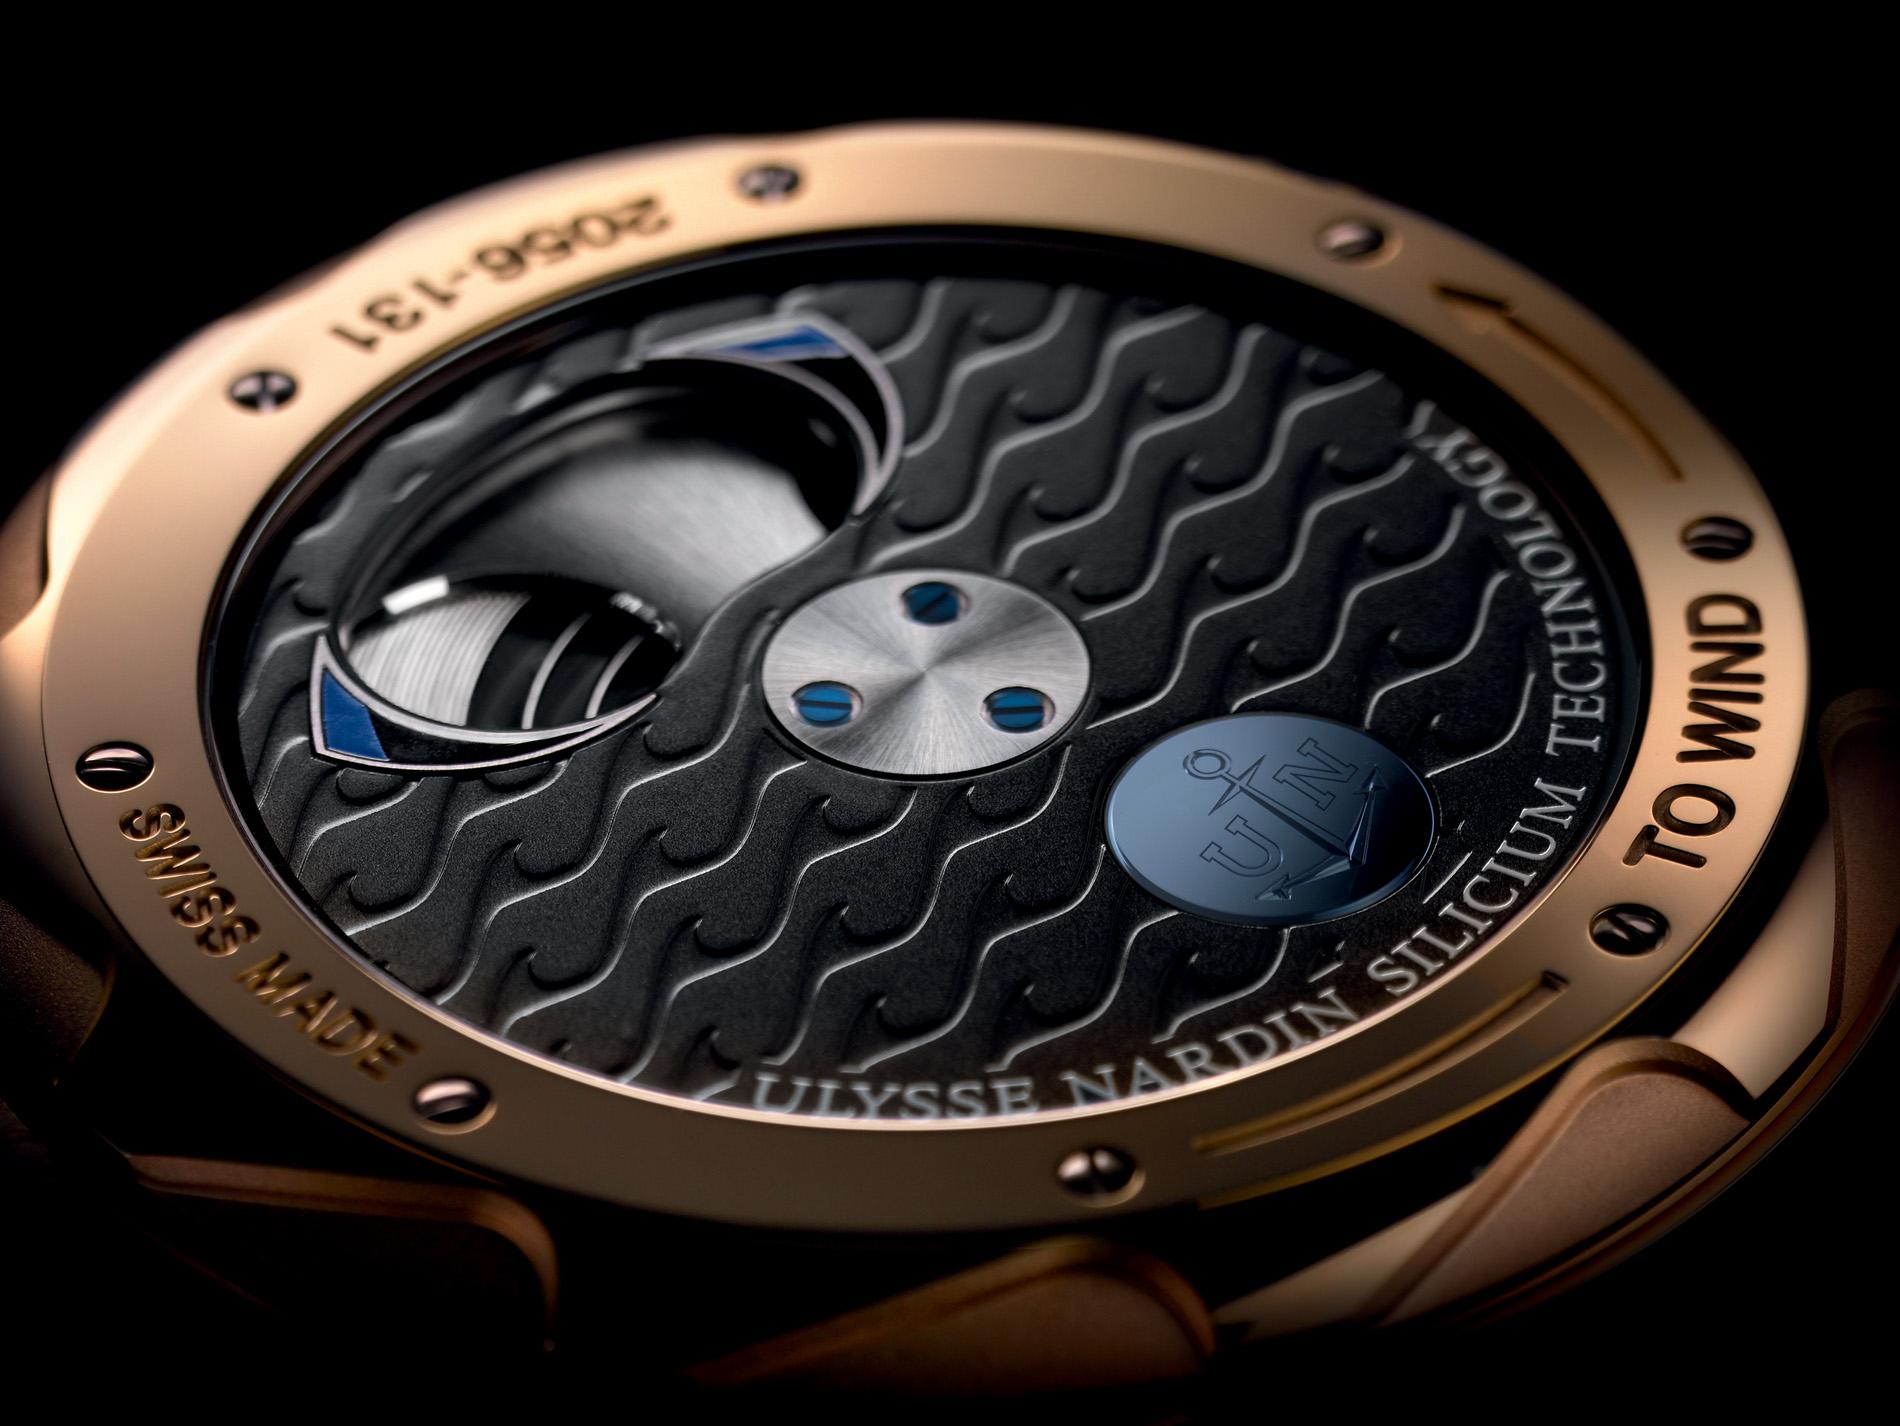 Часы Наручные часы Купить швейцарские часы Магазин